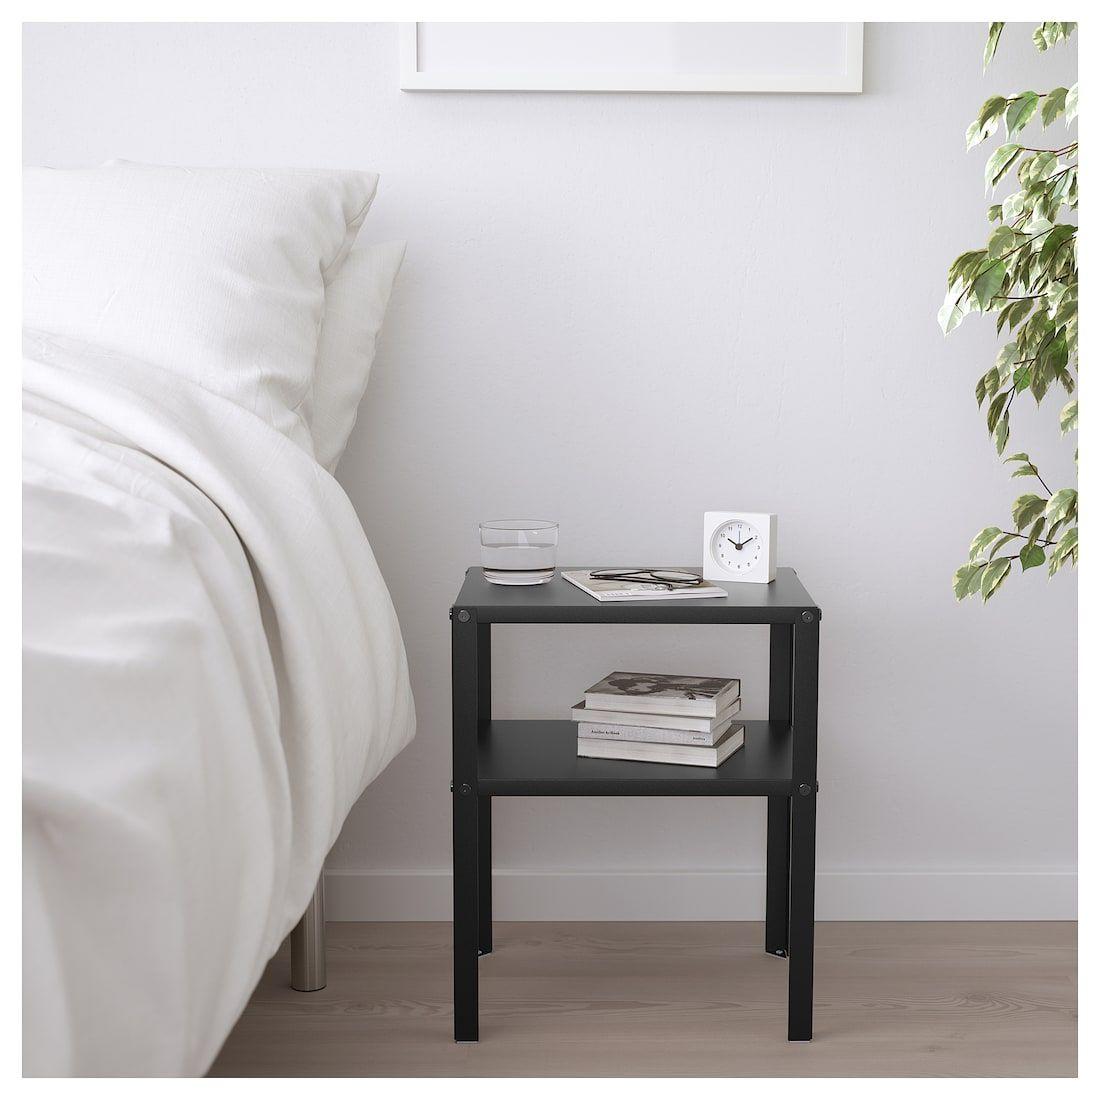 Knarrevik Nightstand Black 14 5 8x11 Ikea Cheap Bedside Tables Small Nightstand Black Bedside Table